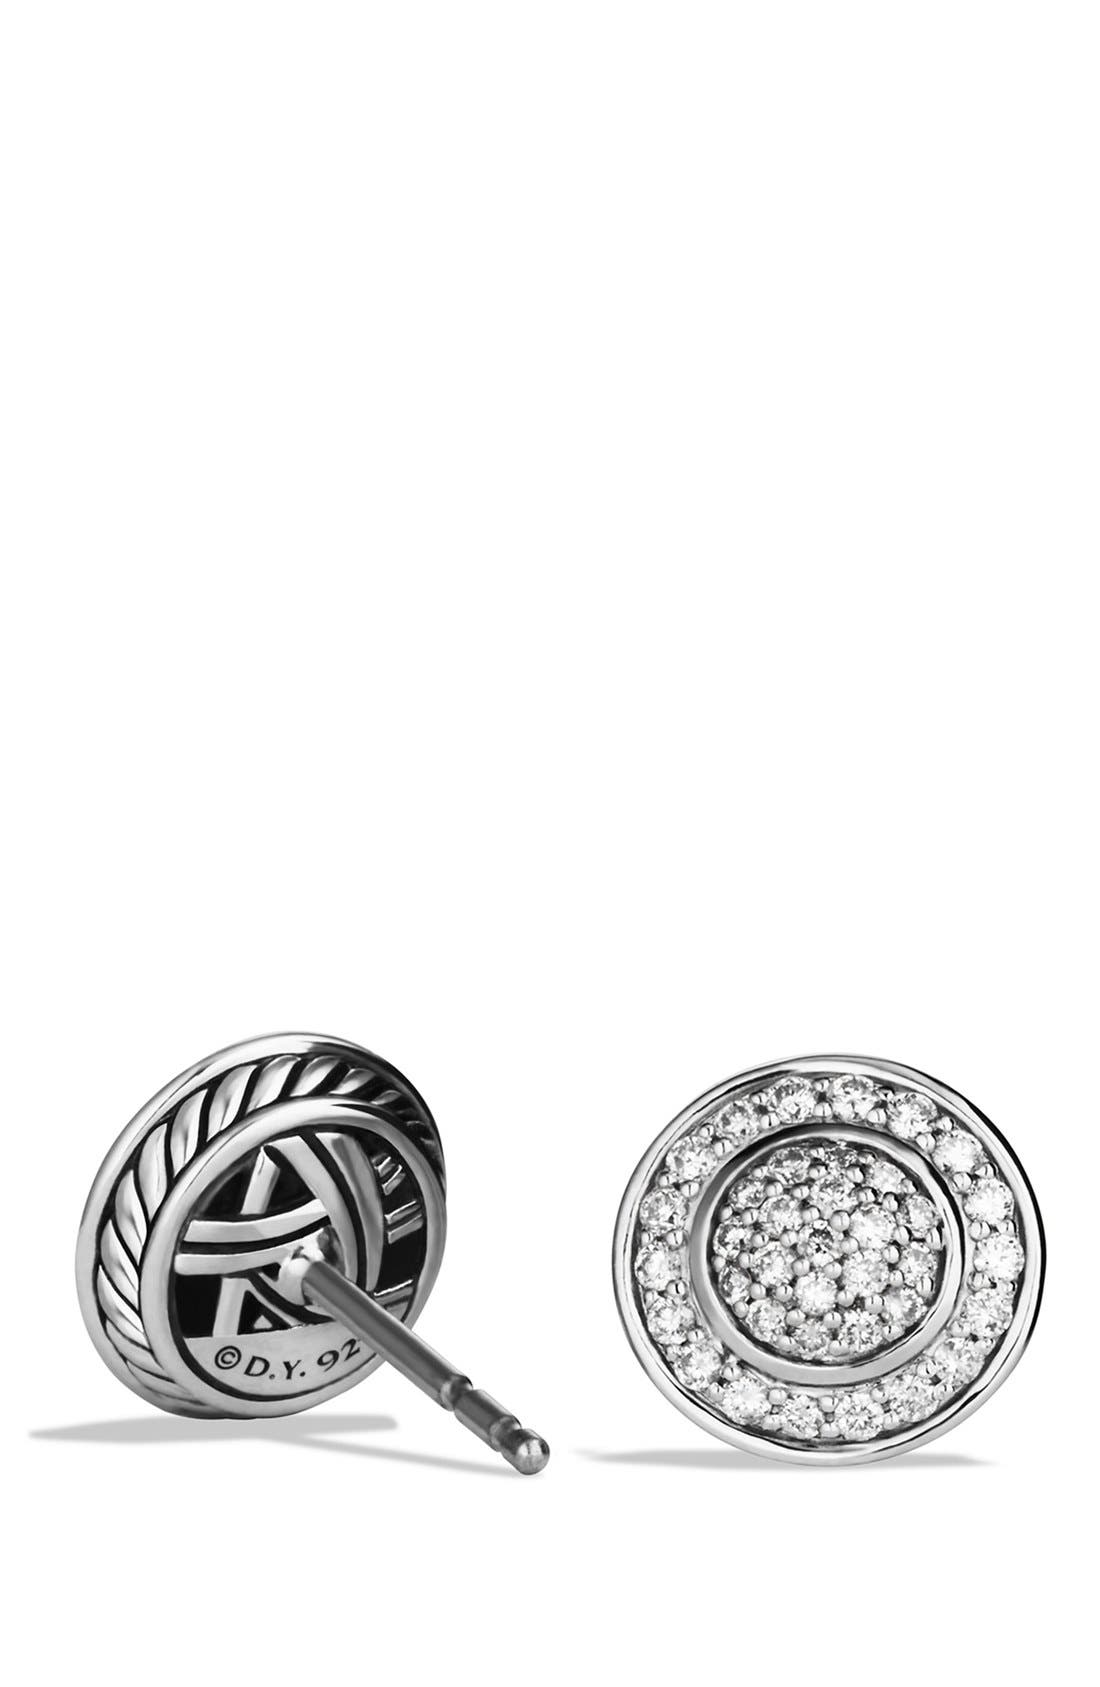 Alternate Image 2  - David Yurman 'Cerise' Mini Earrings with Diamonds